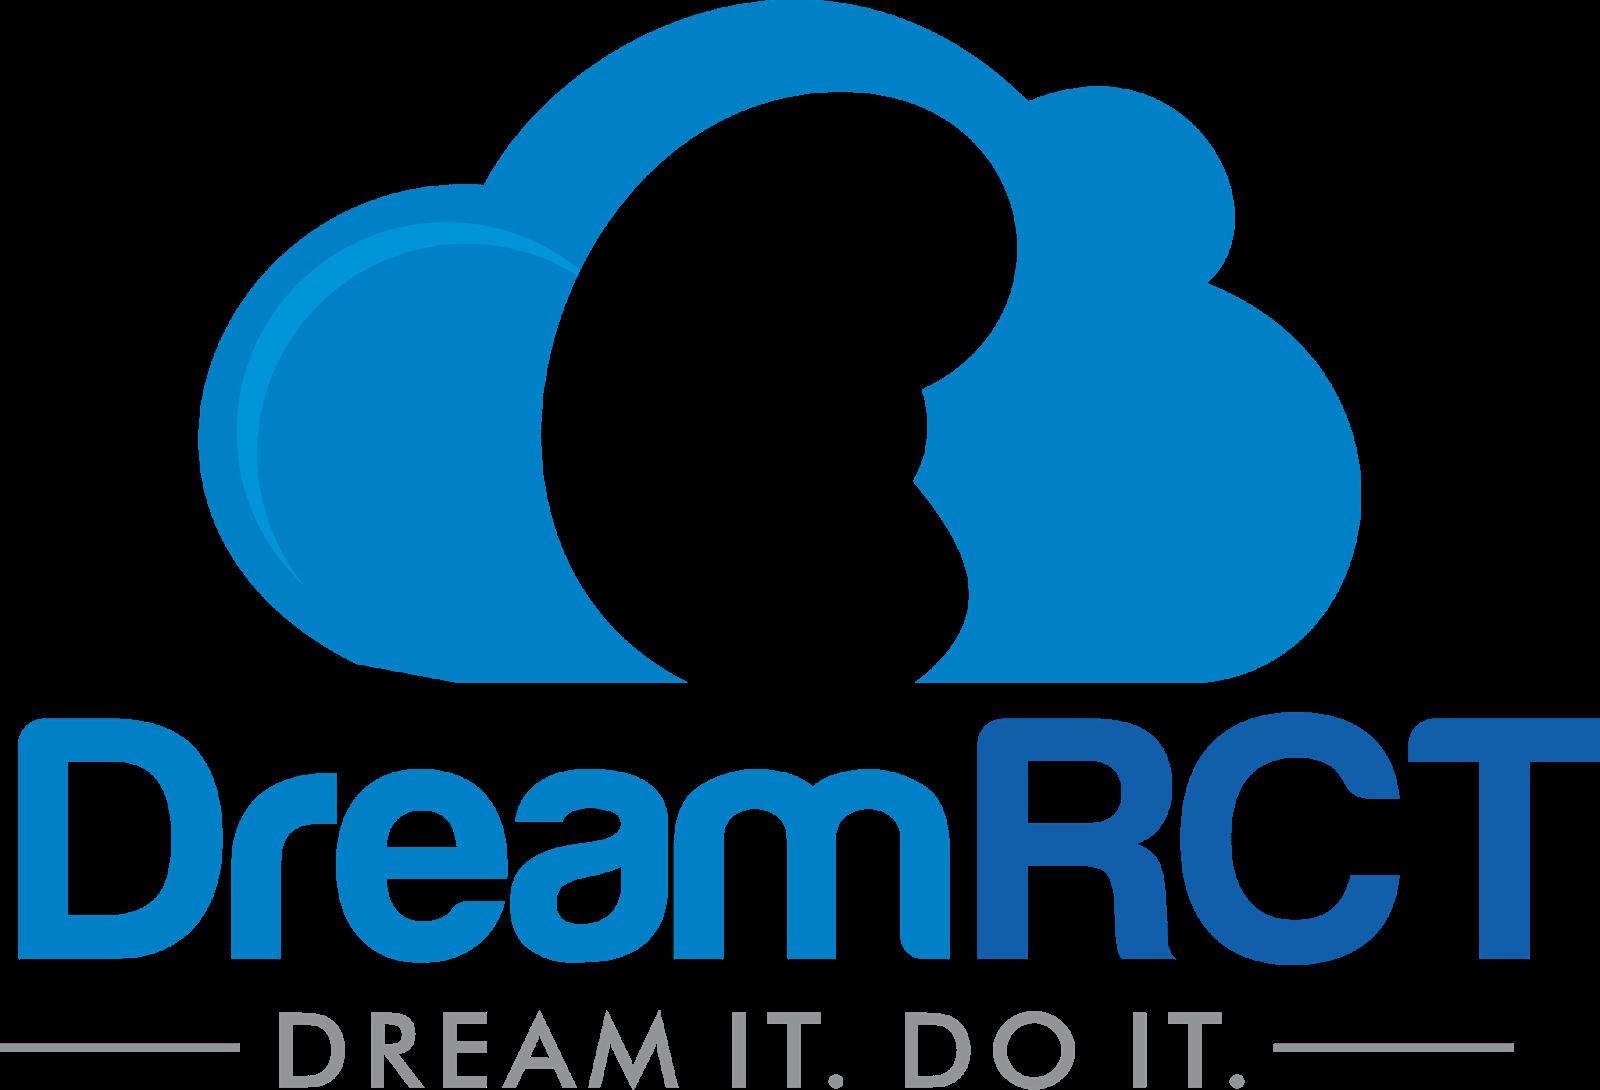 #DreamRCT Phase 2